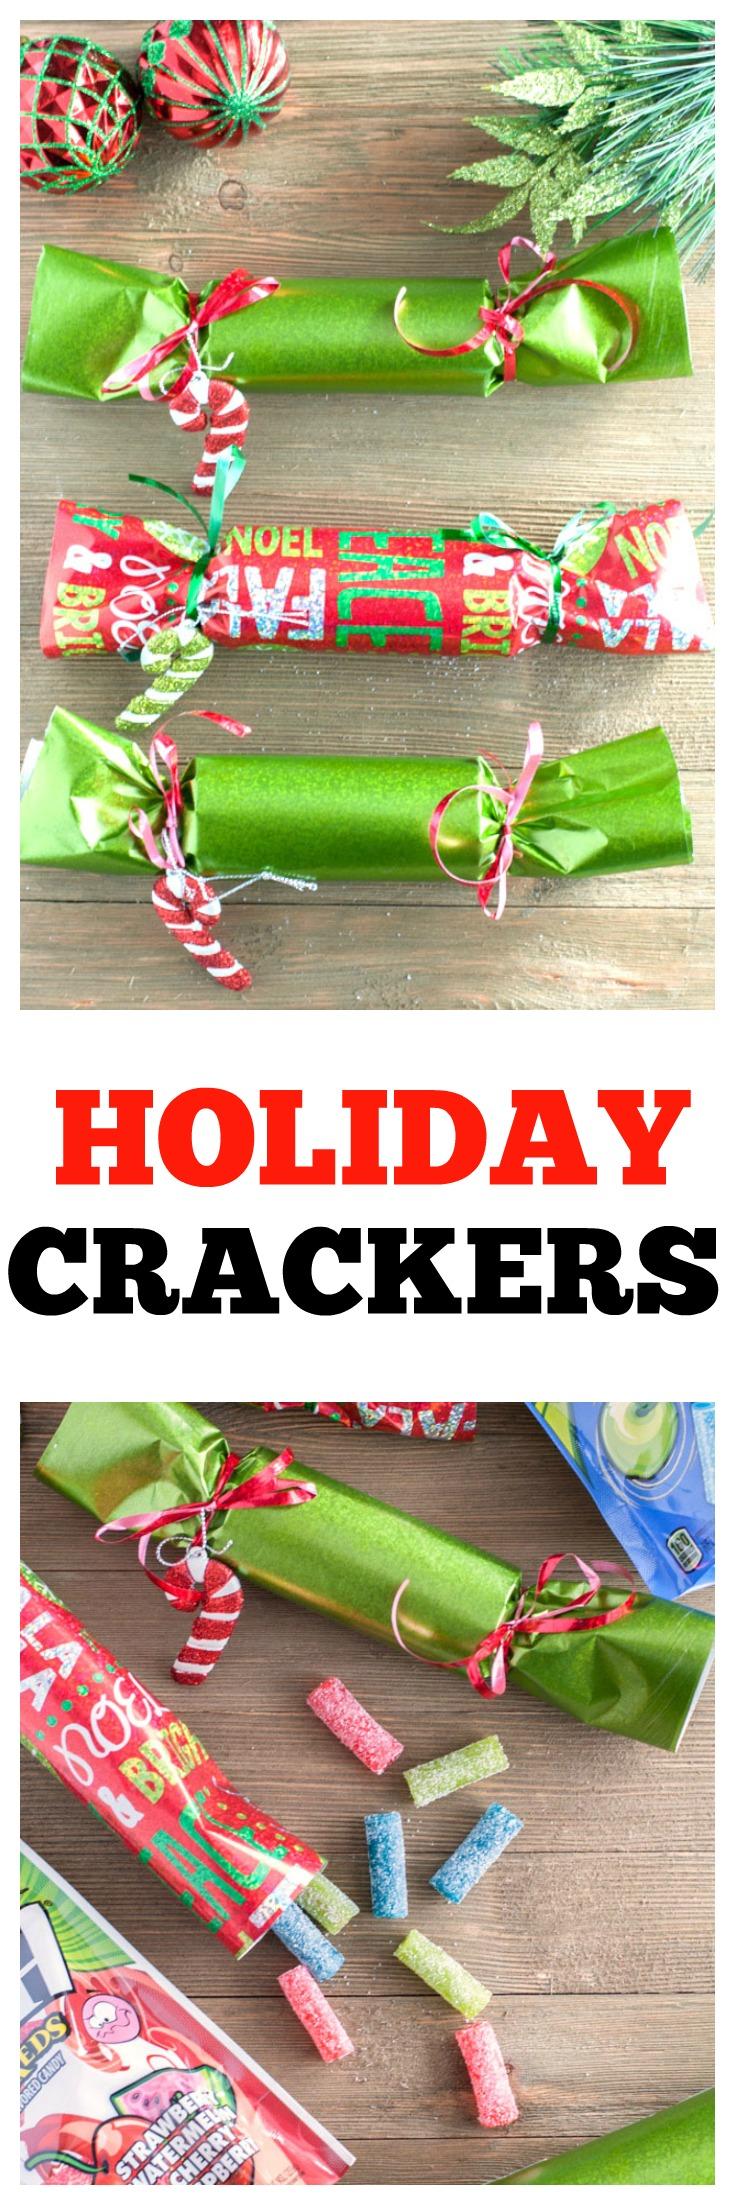 diy crackers